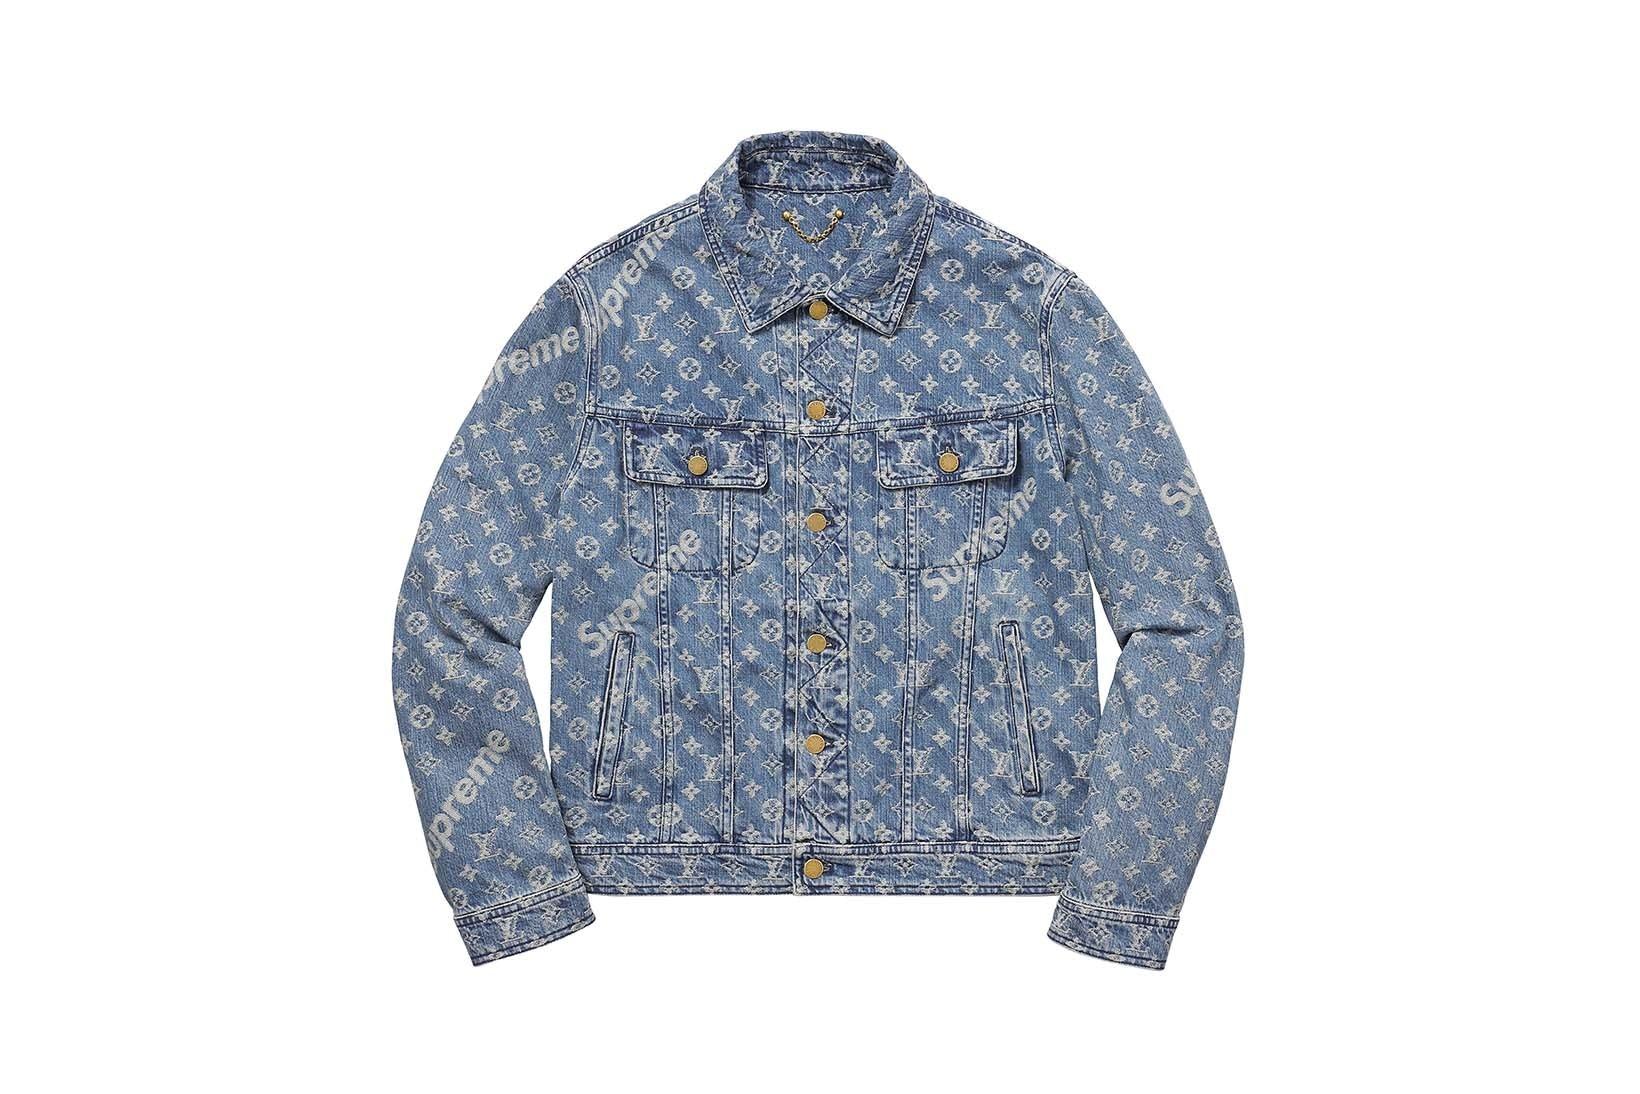 Supreme(シュプリーム)×Louis Vuitton(ルイ・ヴィトン) / ジャカード デニム トラッカー ジャケット(Jacquard Denim Trucker Jacket)